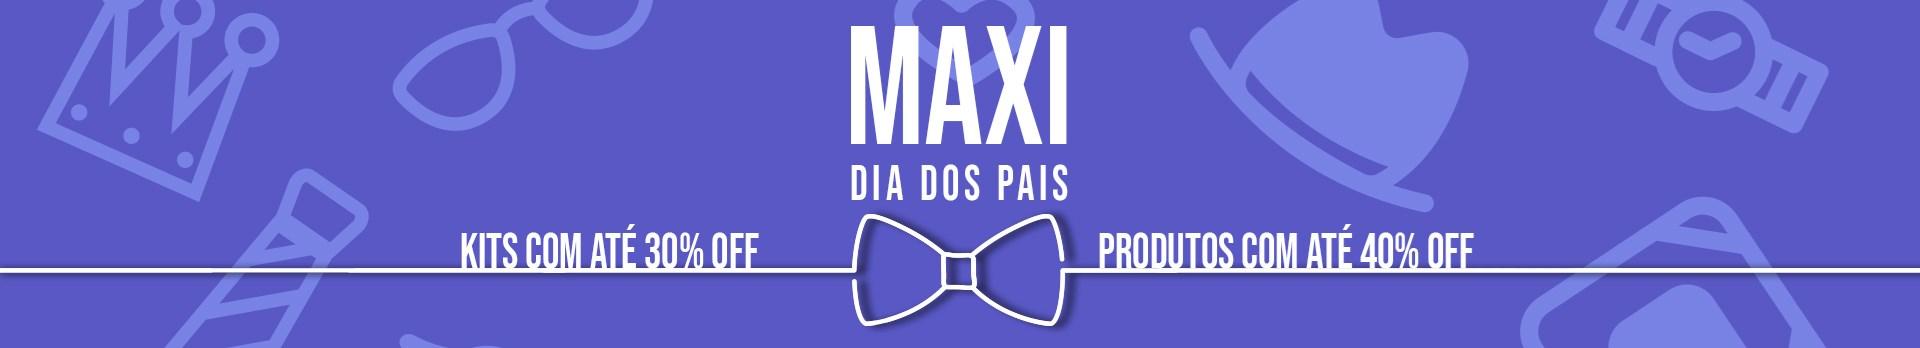 Maxi Dia dos Pais